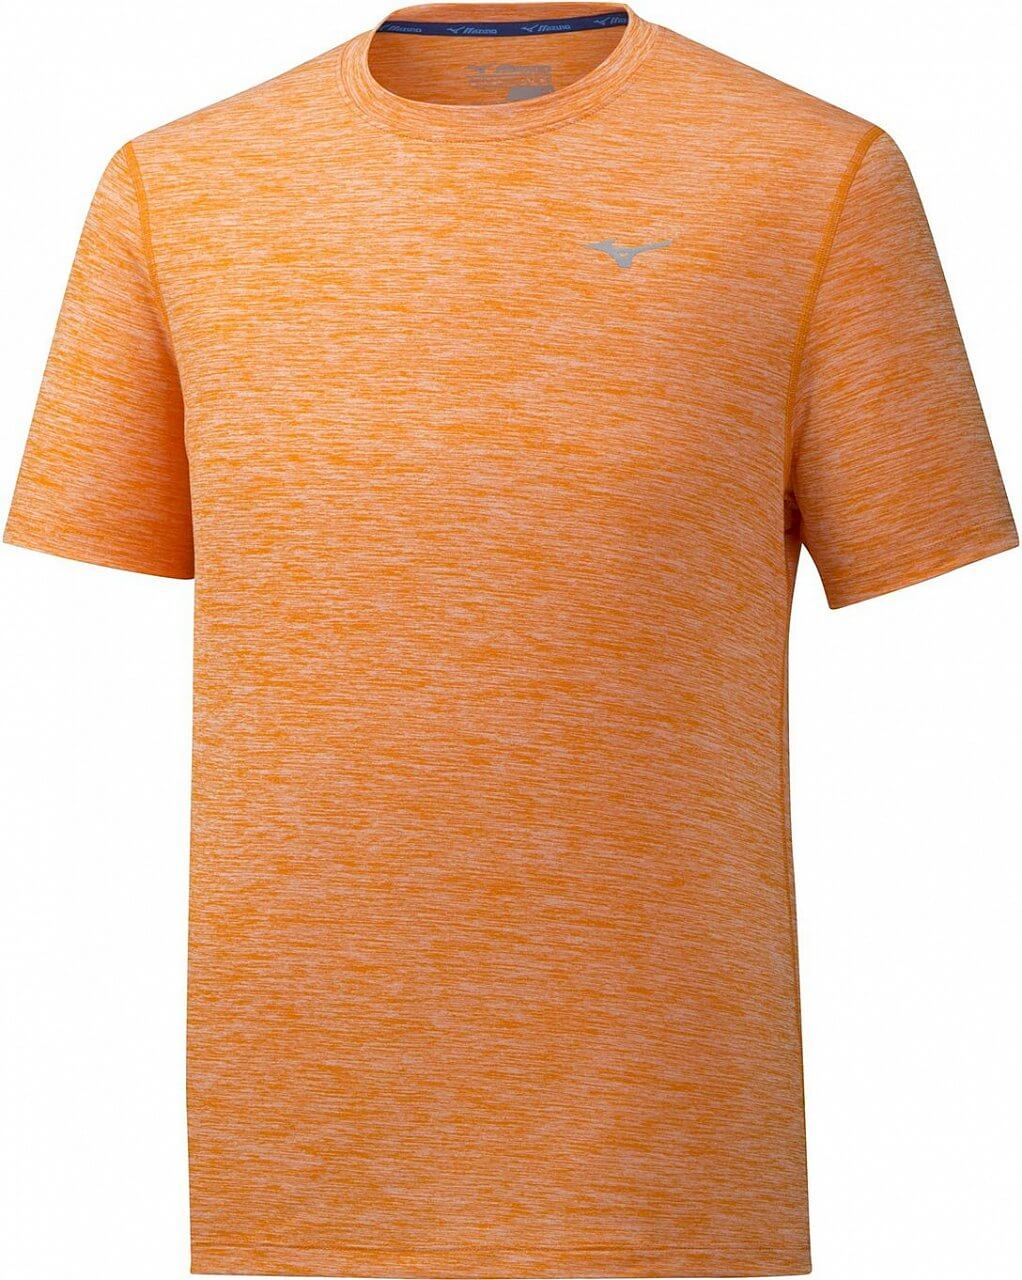 228fb4ad1 Mizuno Impulse Core Tee - pánské tričko | Sanasport.cz